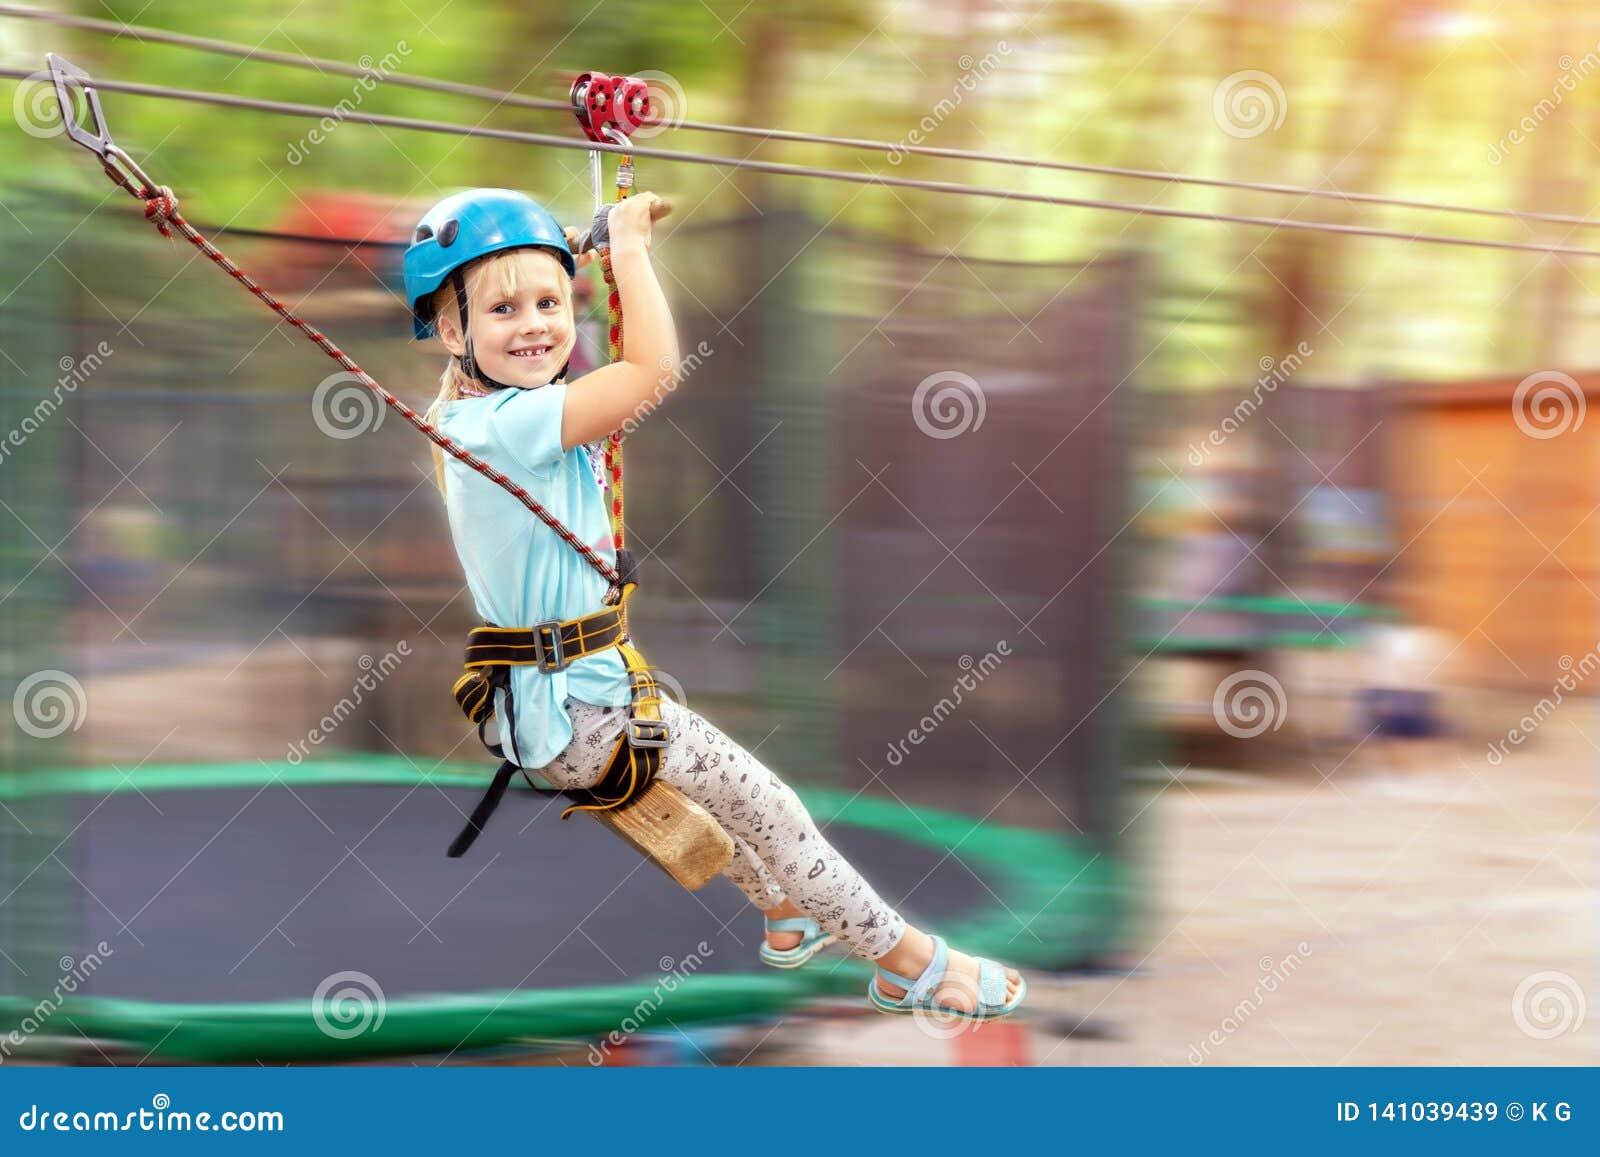 Cute little funny caucasion blond girl in helmet having fun riding rope zipline in adventure park. Children outdoor extreme sport